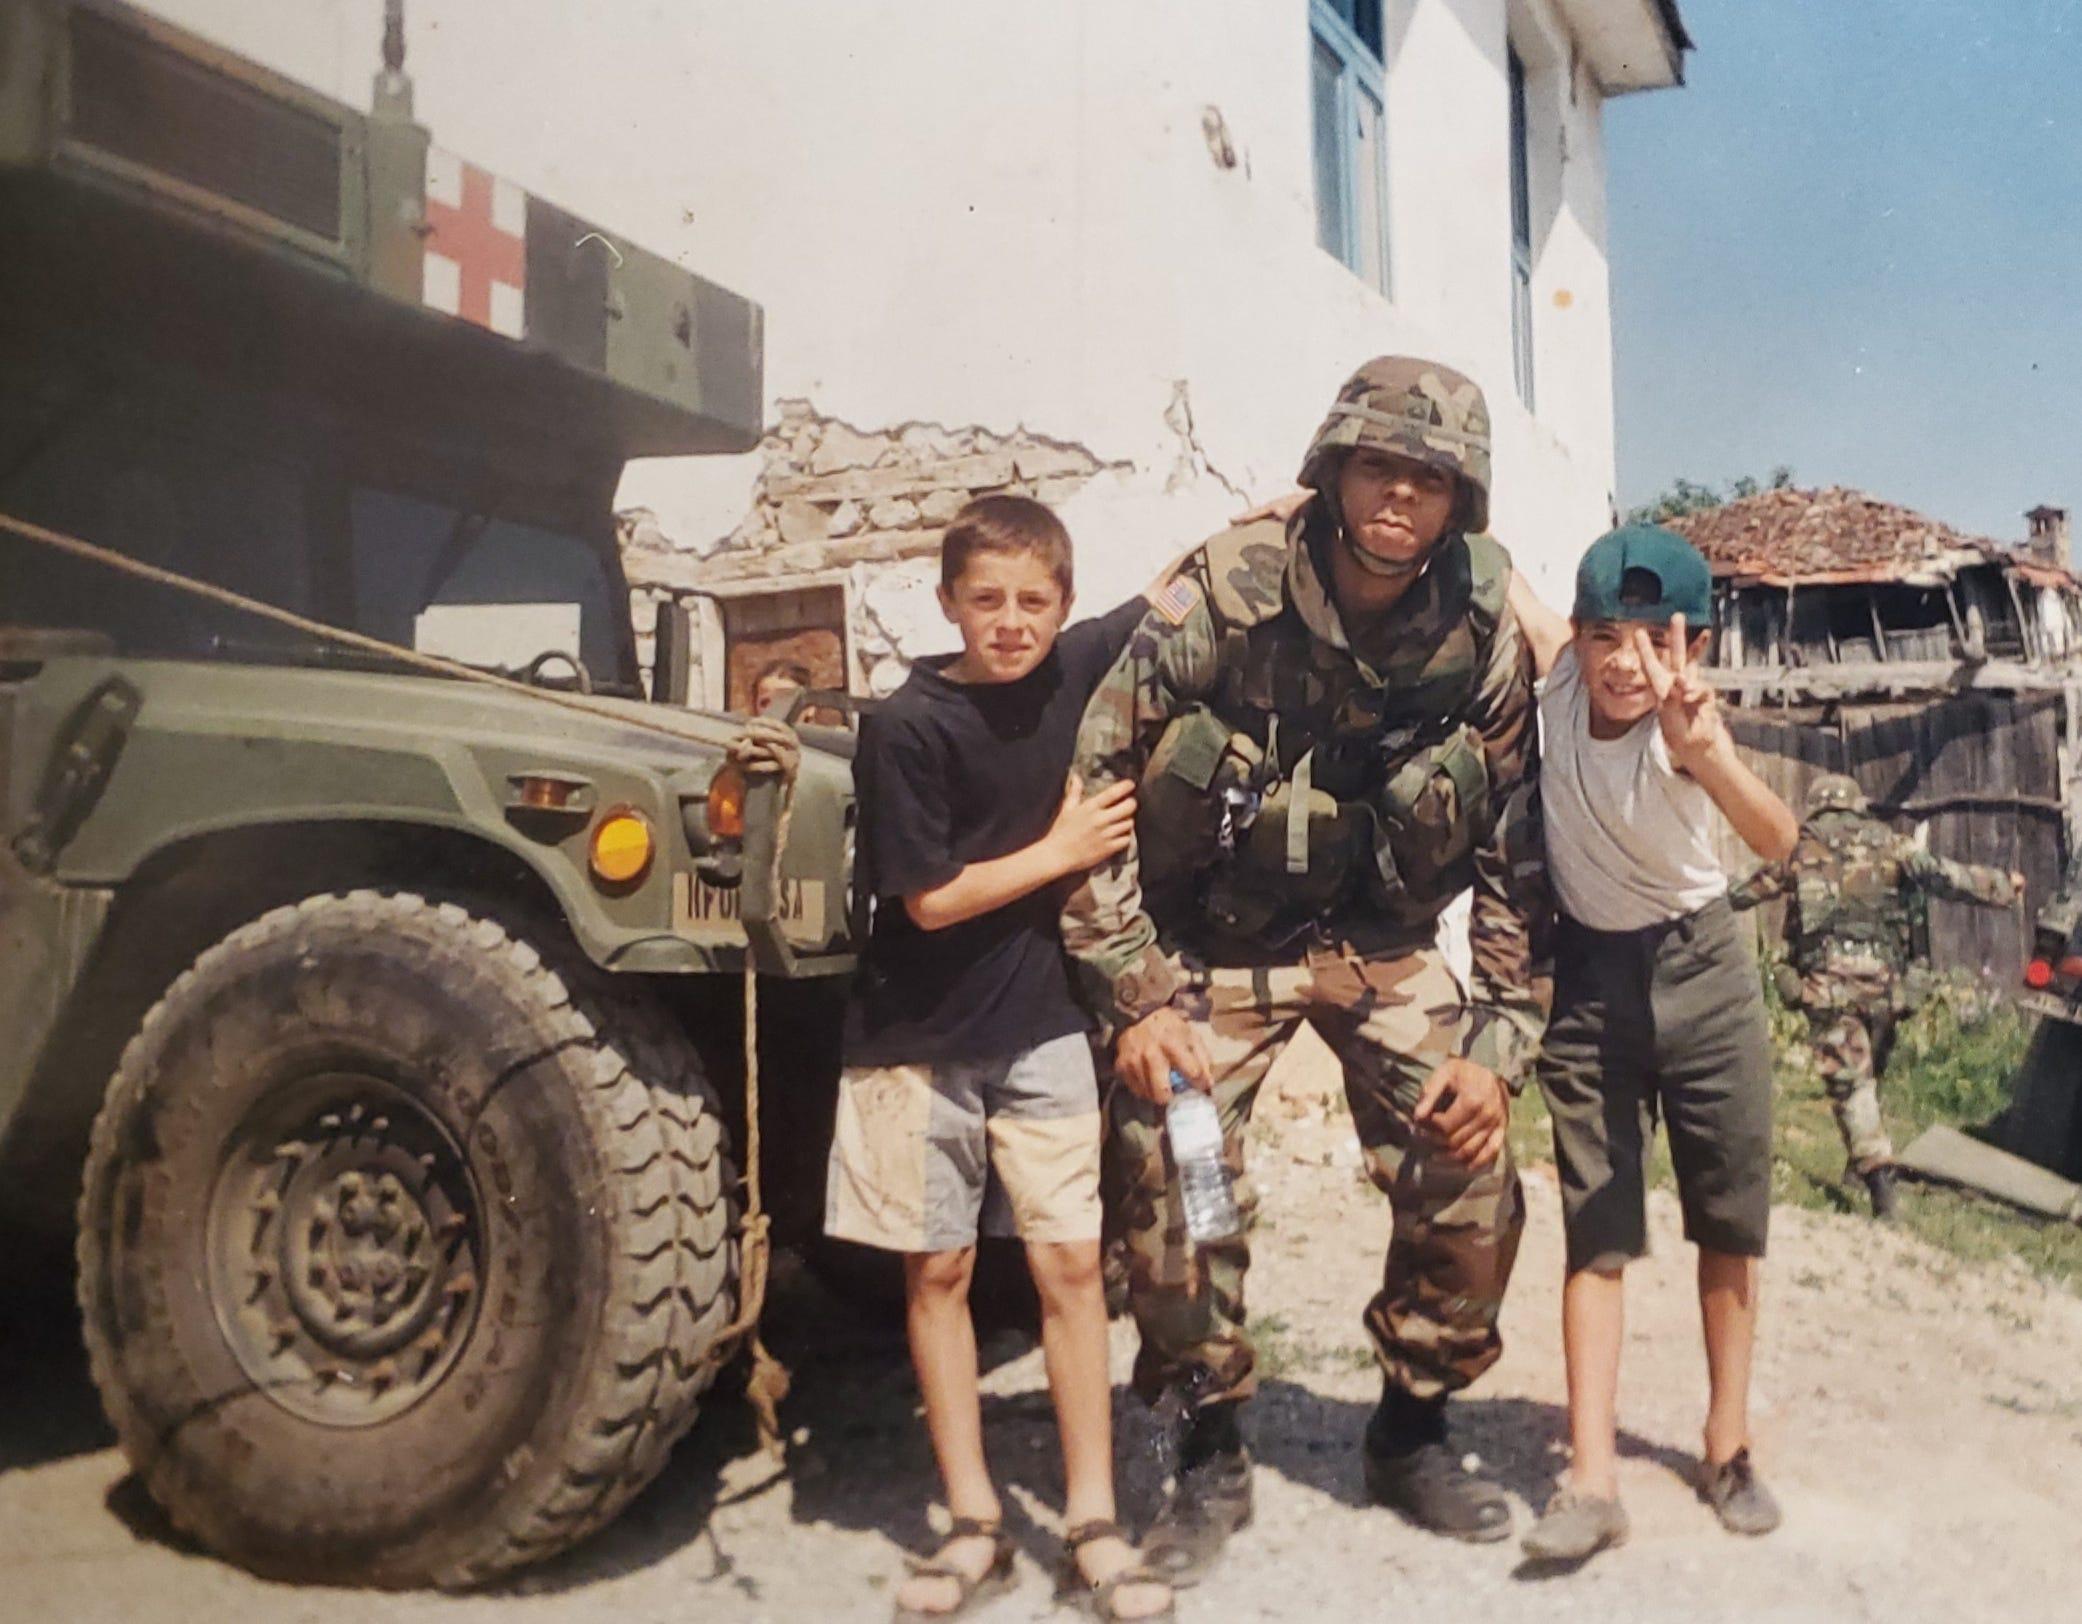 Gregory Lloyd Edwards was a US Army veteran combat medic.